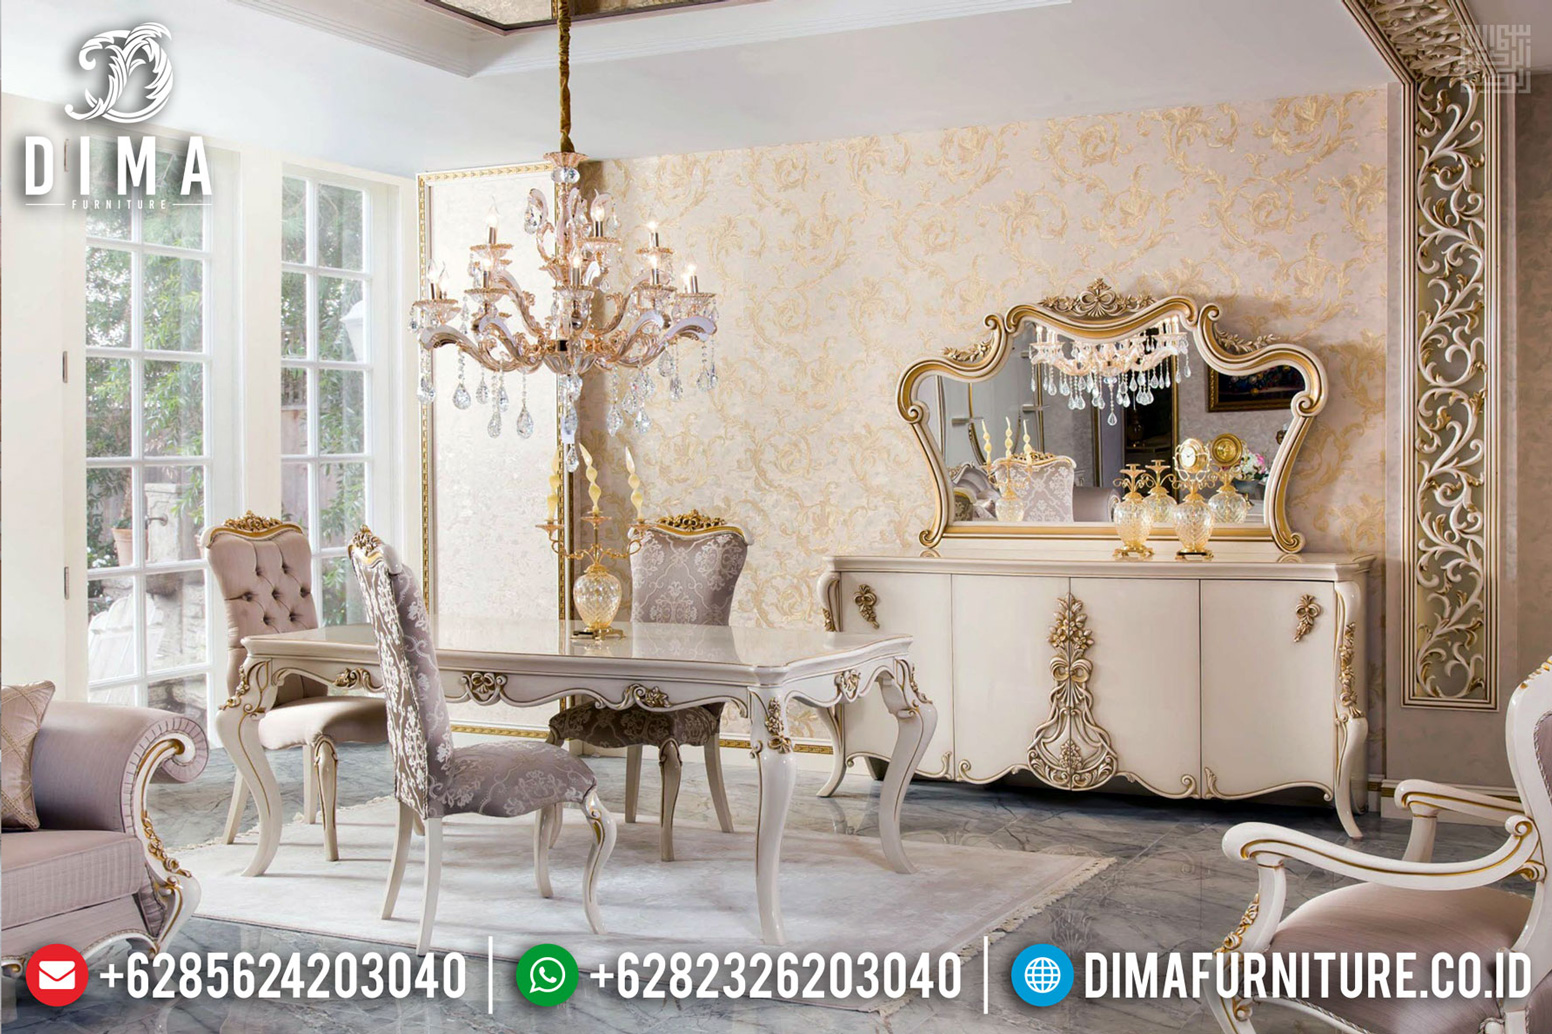 Jual Meja Makan Mewah, Kursi Meja Makan Ukiran Jepara, Dining Table Luxury Classic MMJ-0501